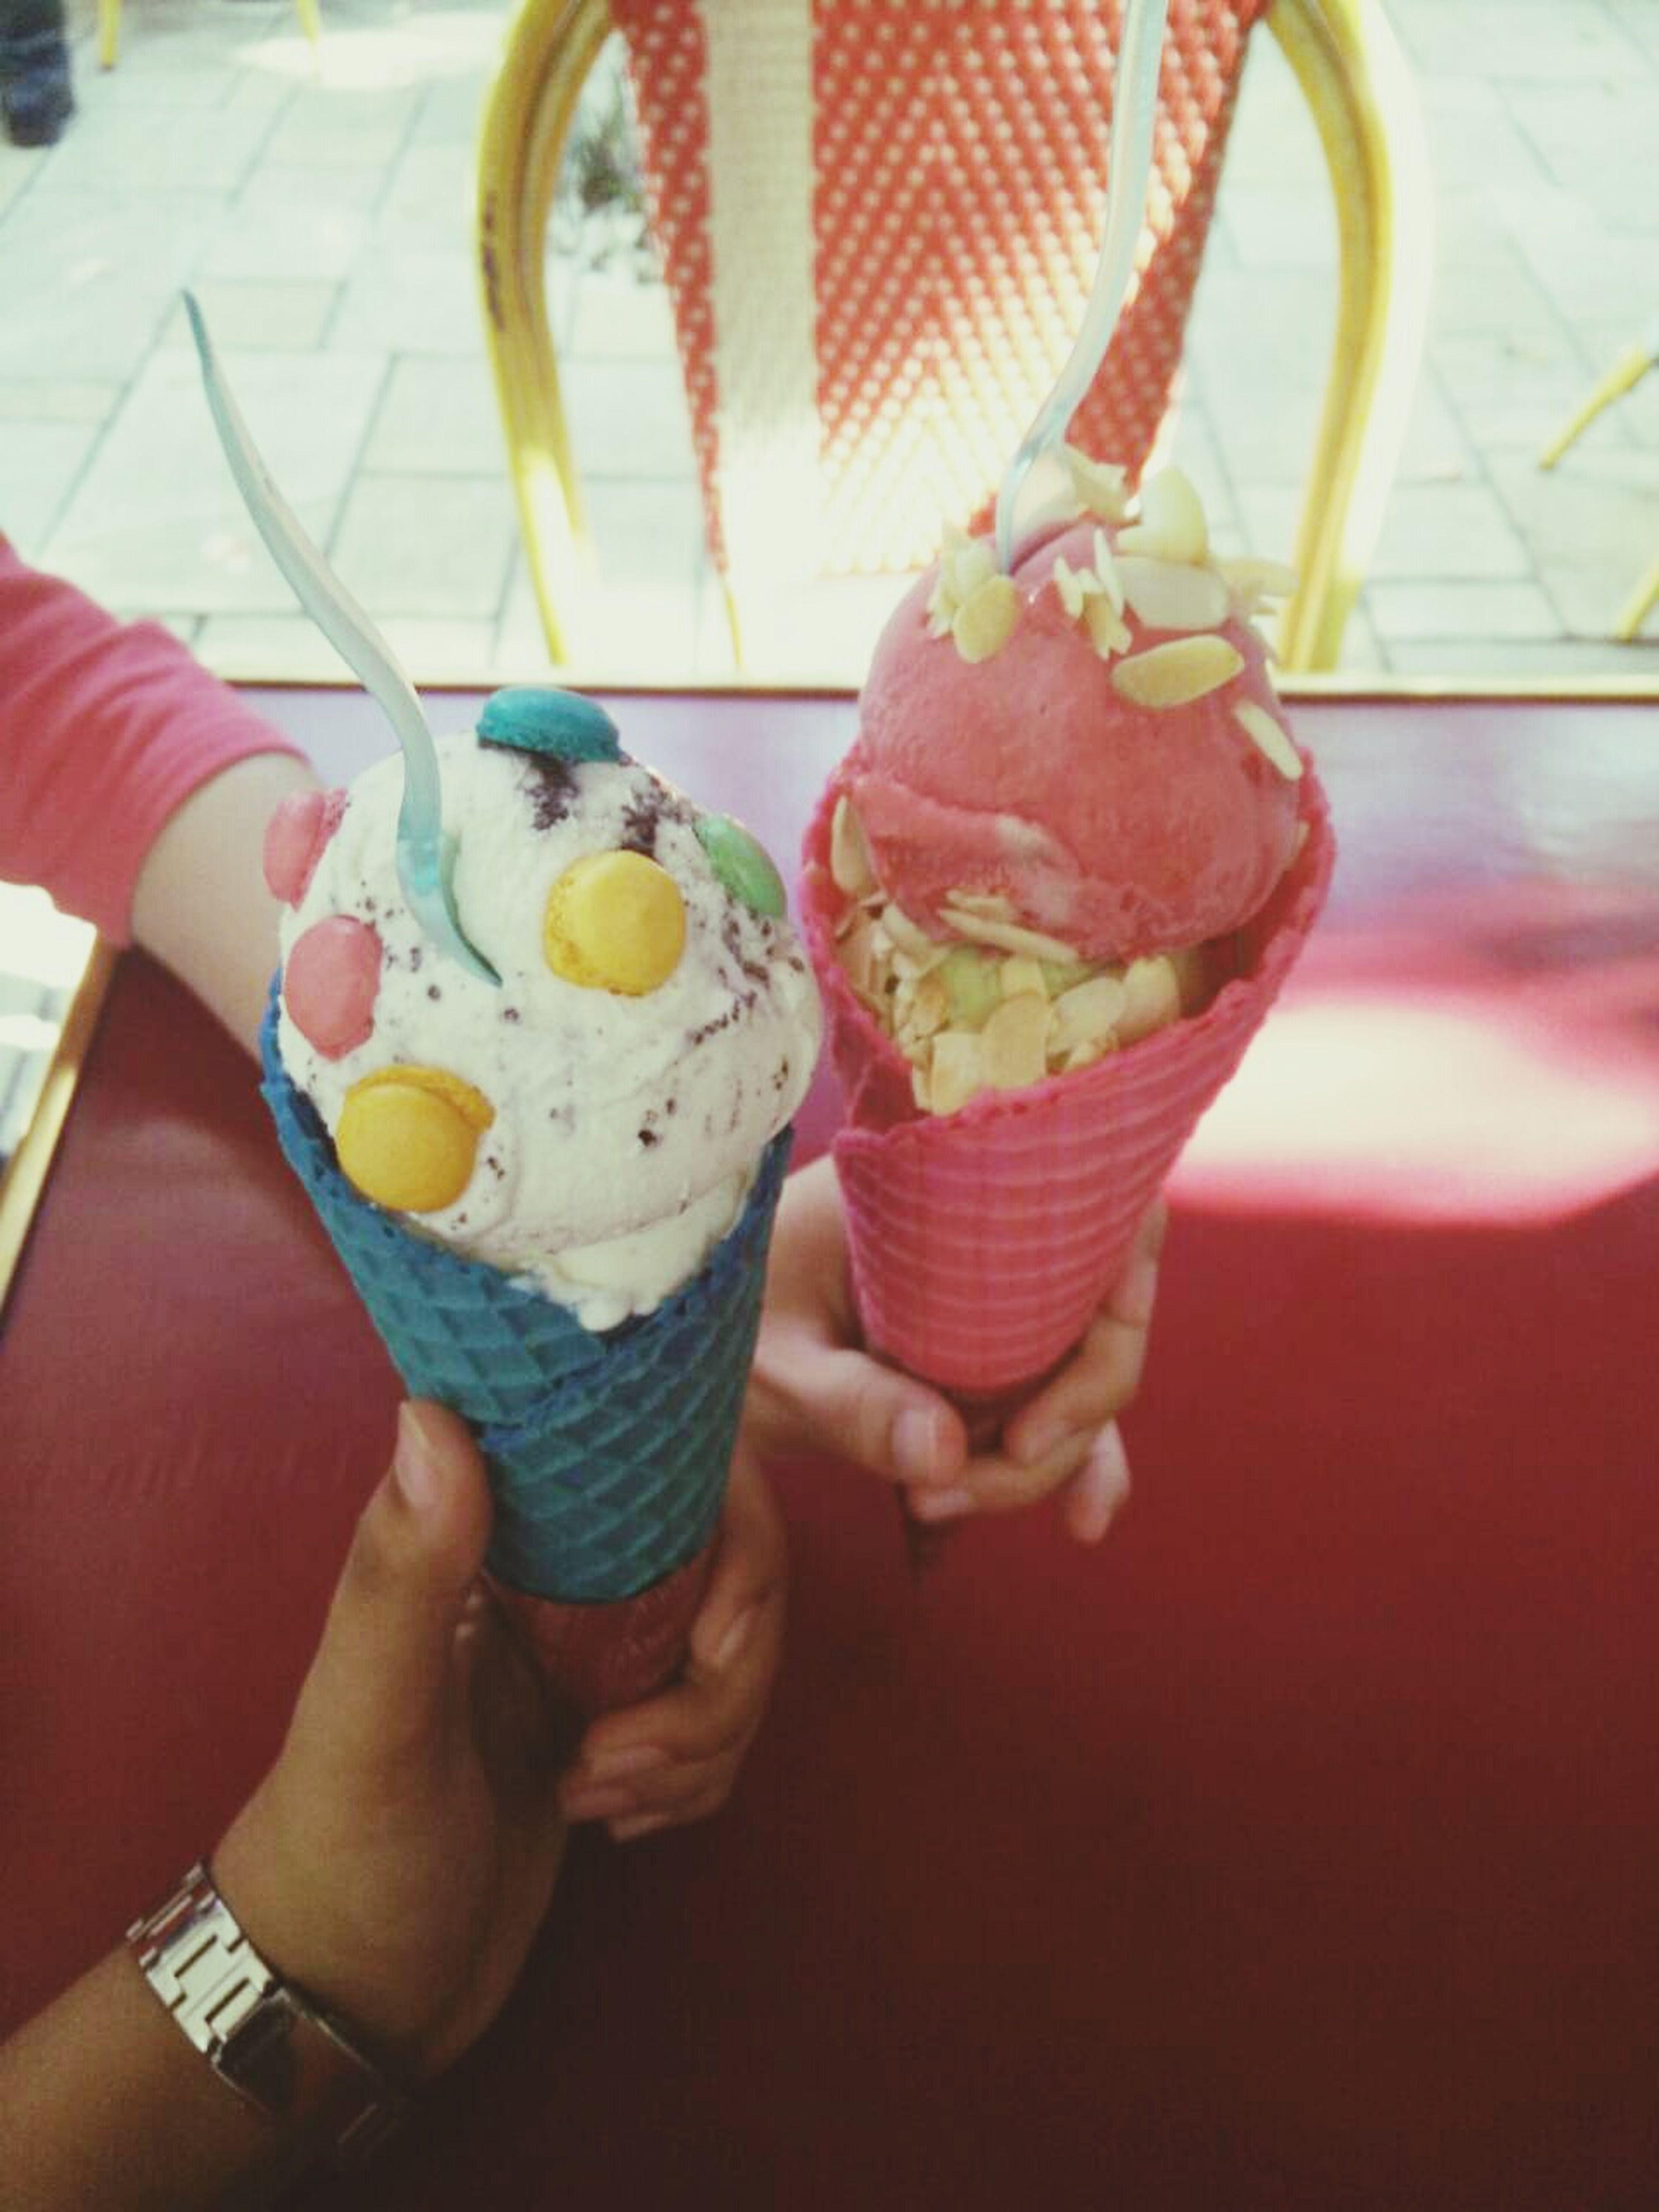 delicious ice creams 😋😋 Gooutwithmyfriends